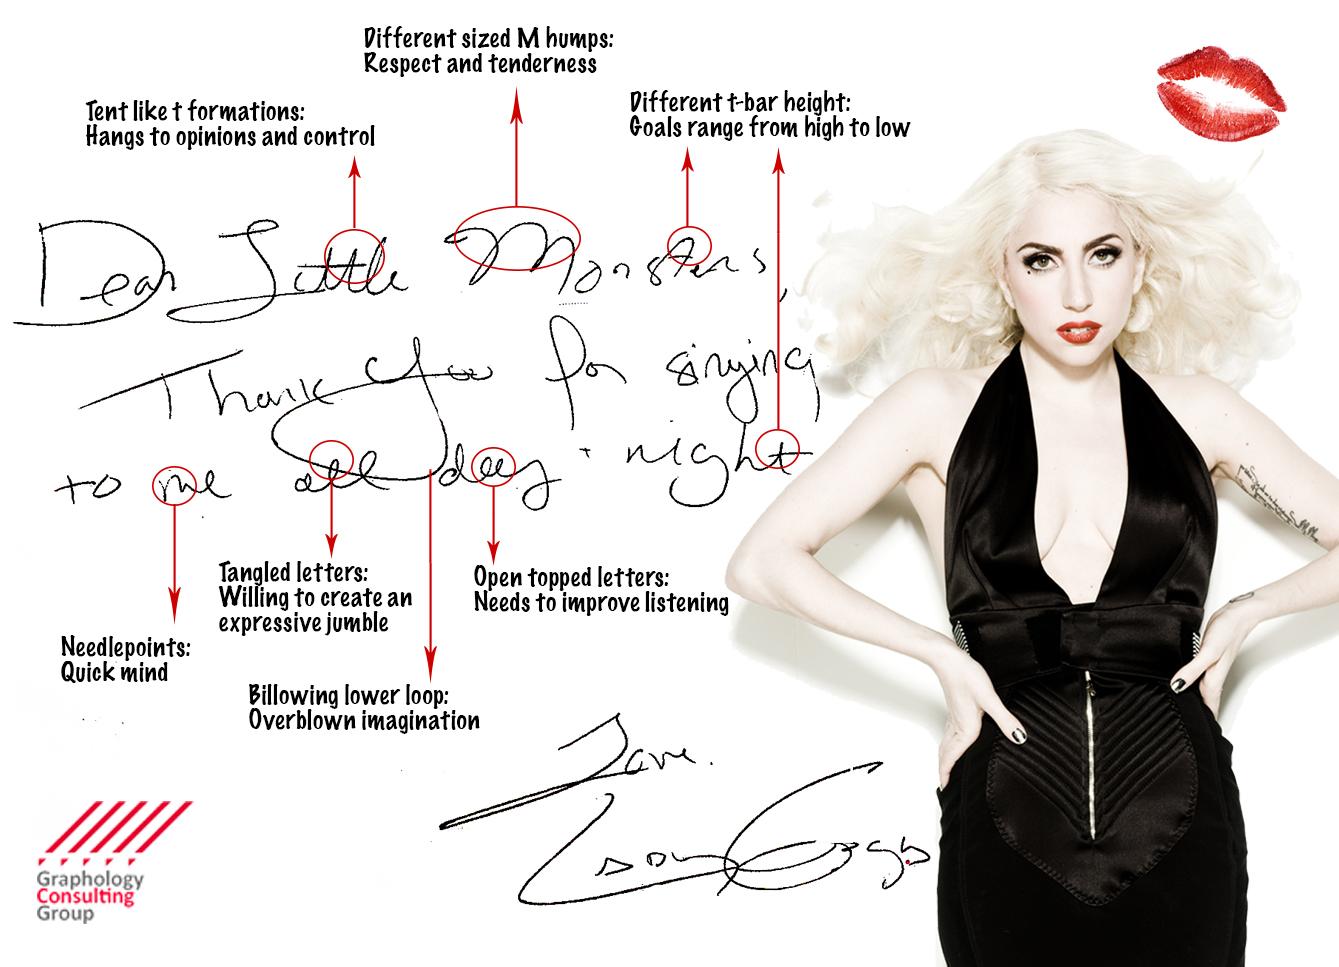 Where can I get Lady Gaga's signature?